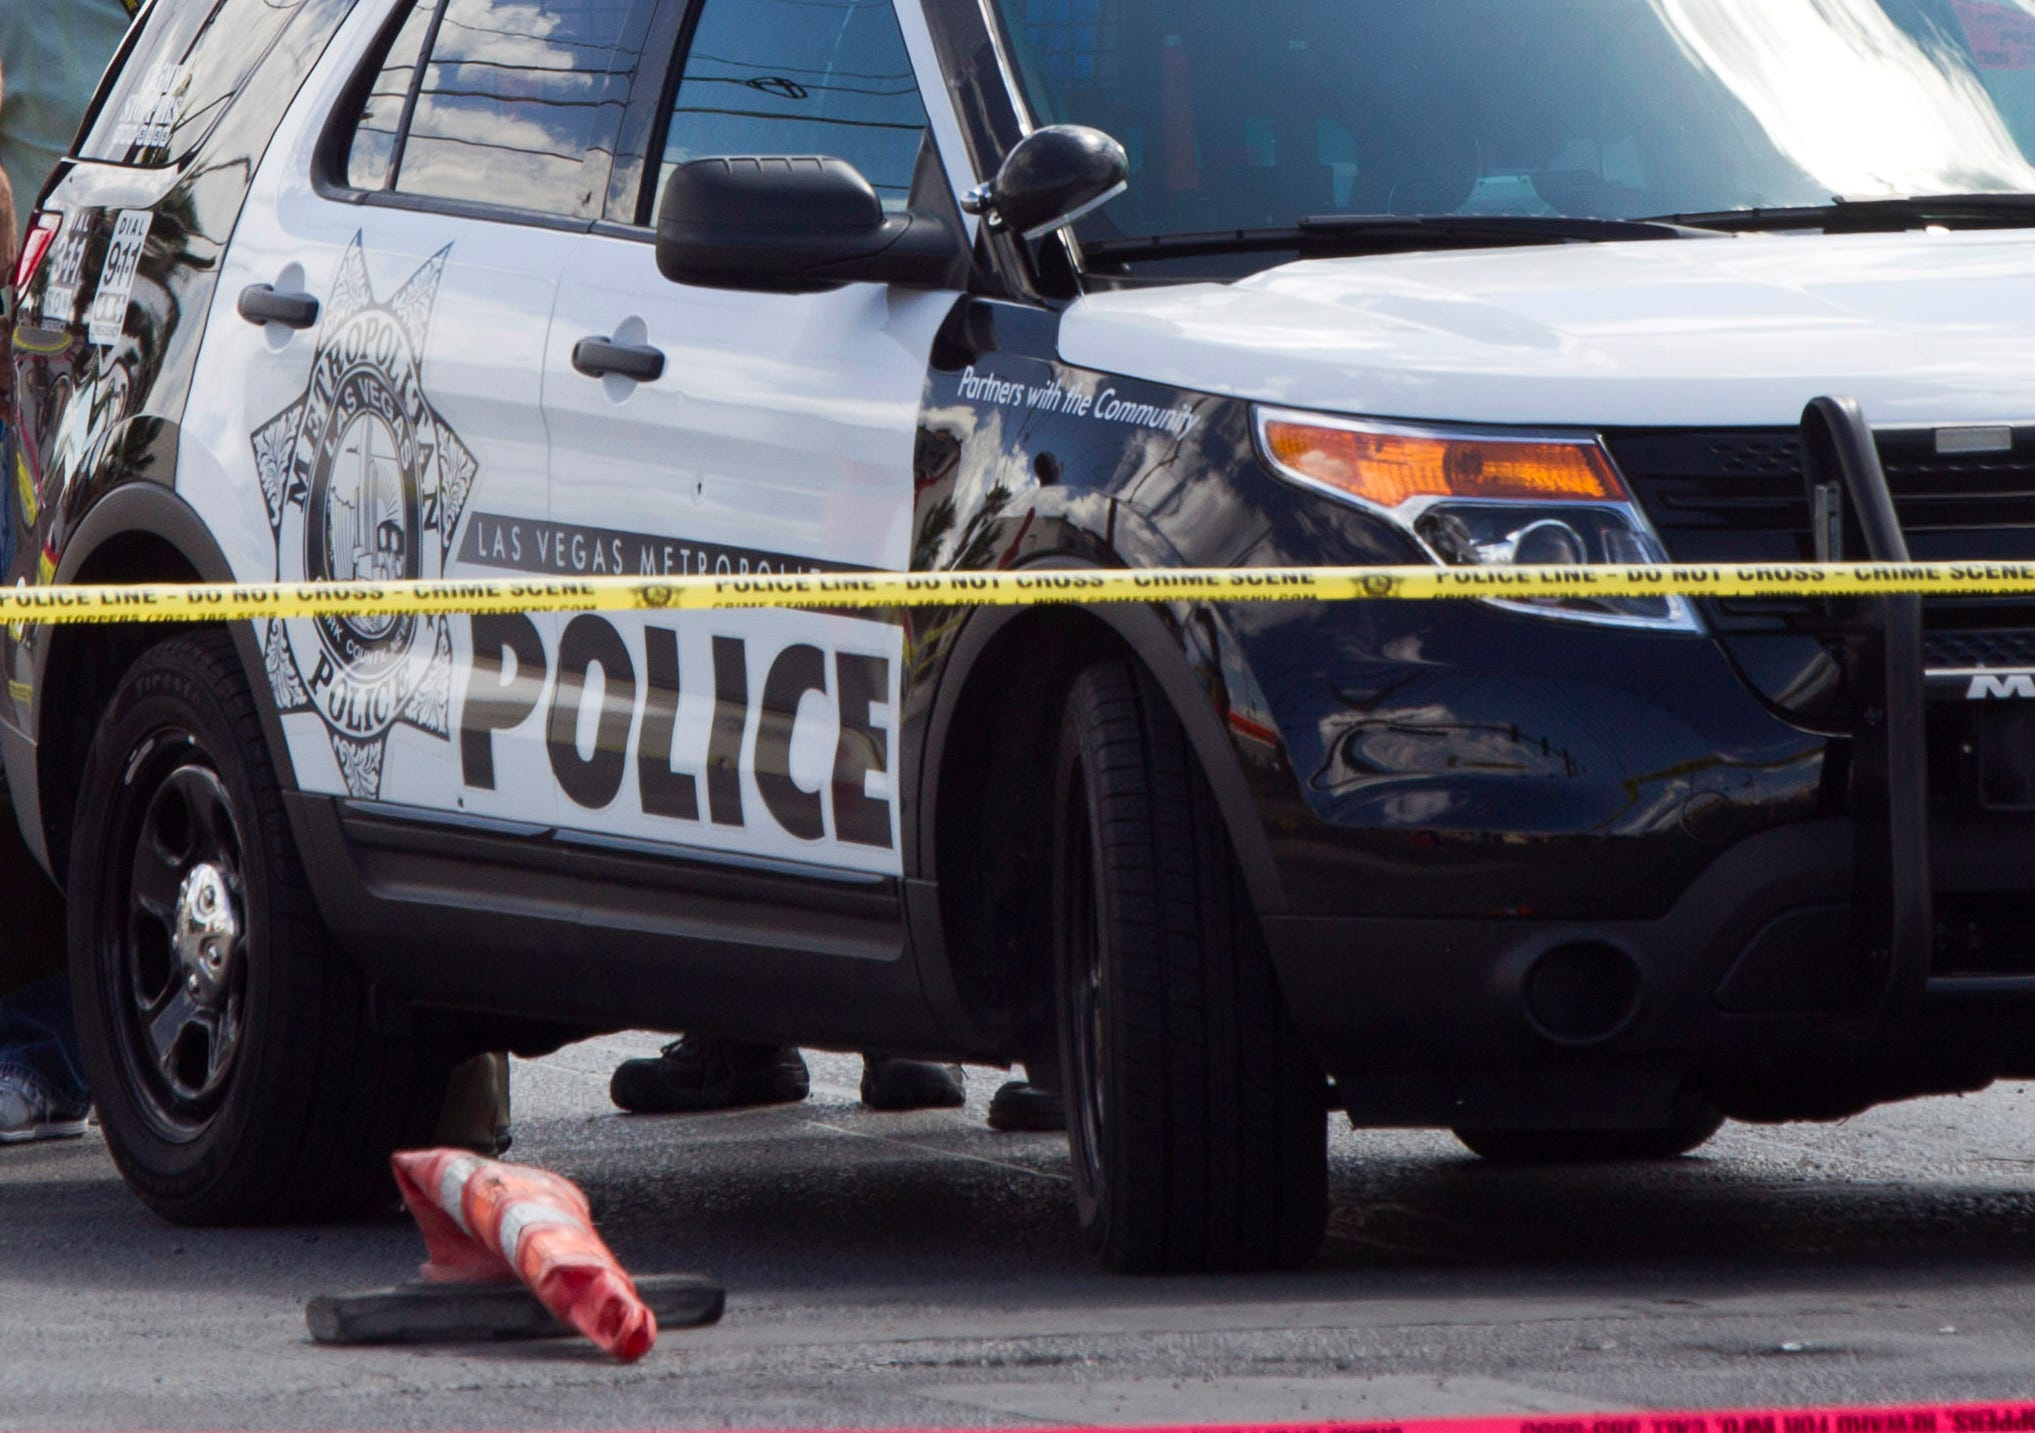 A Las Vegas Metro Police patrol vehicle is seen in this Sept. 4, 2015 photo.